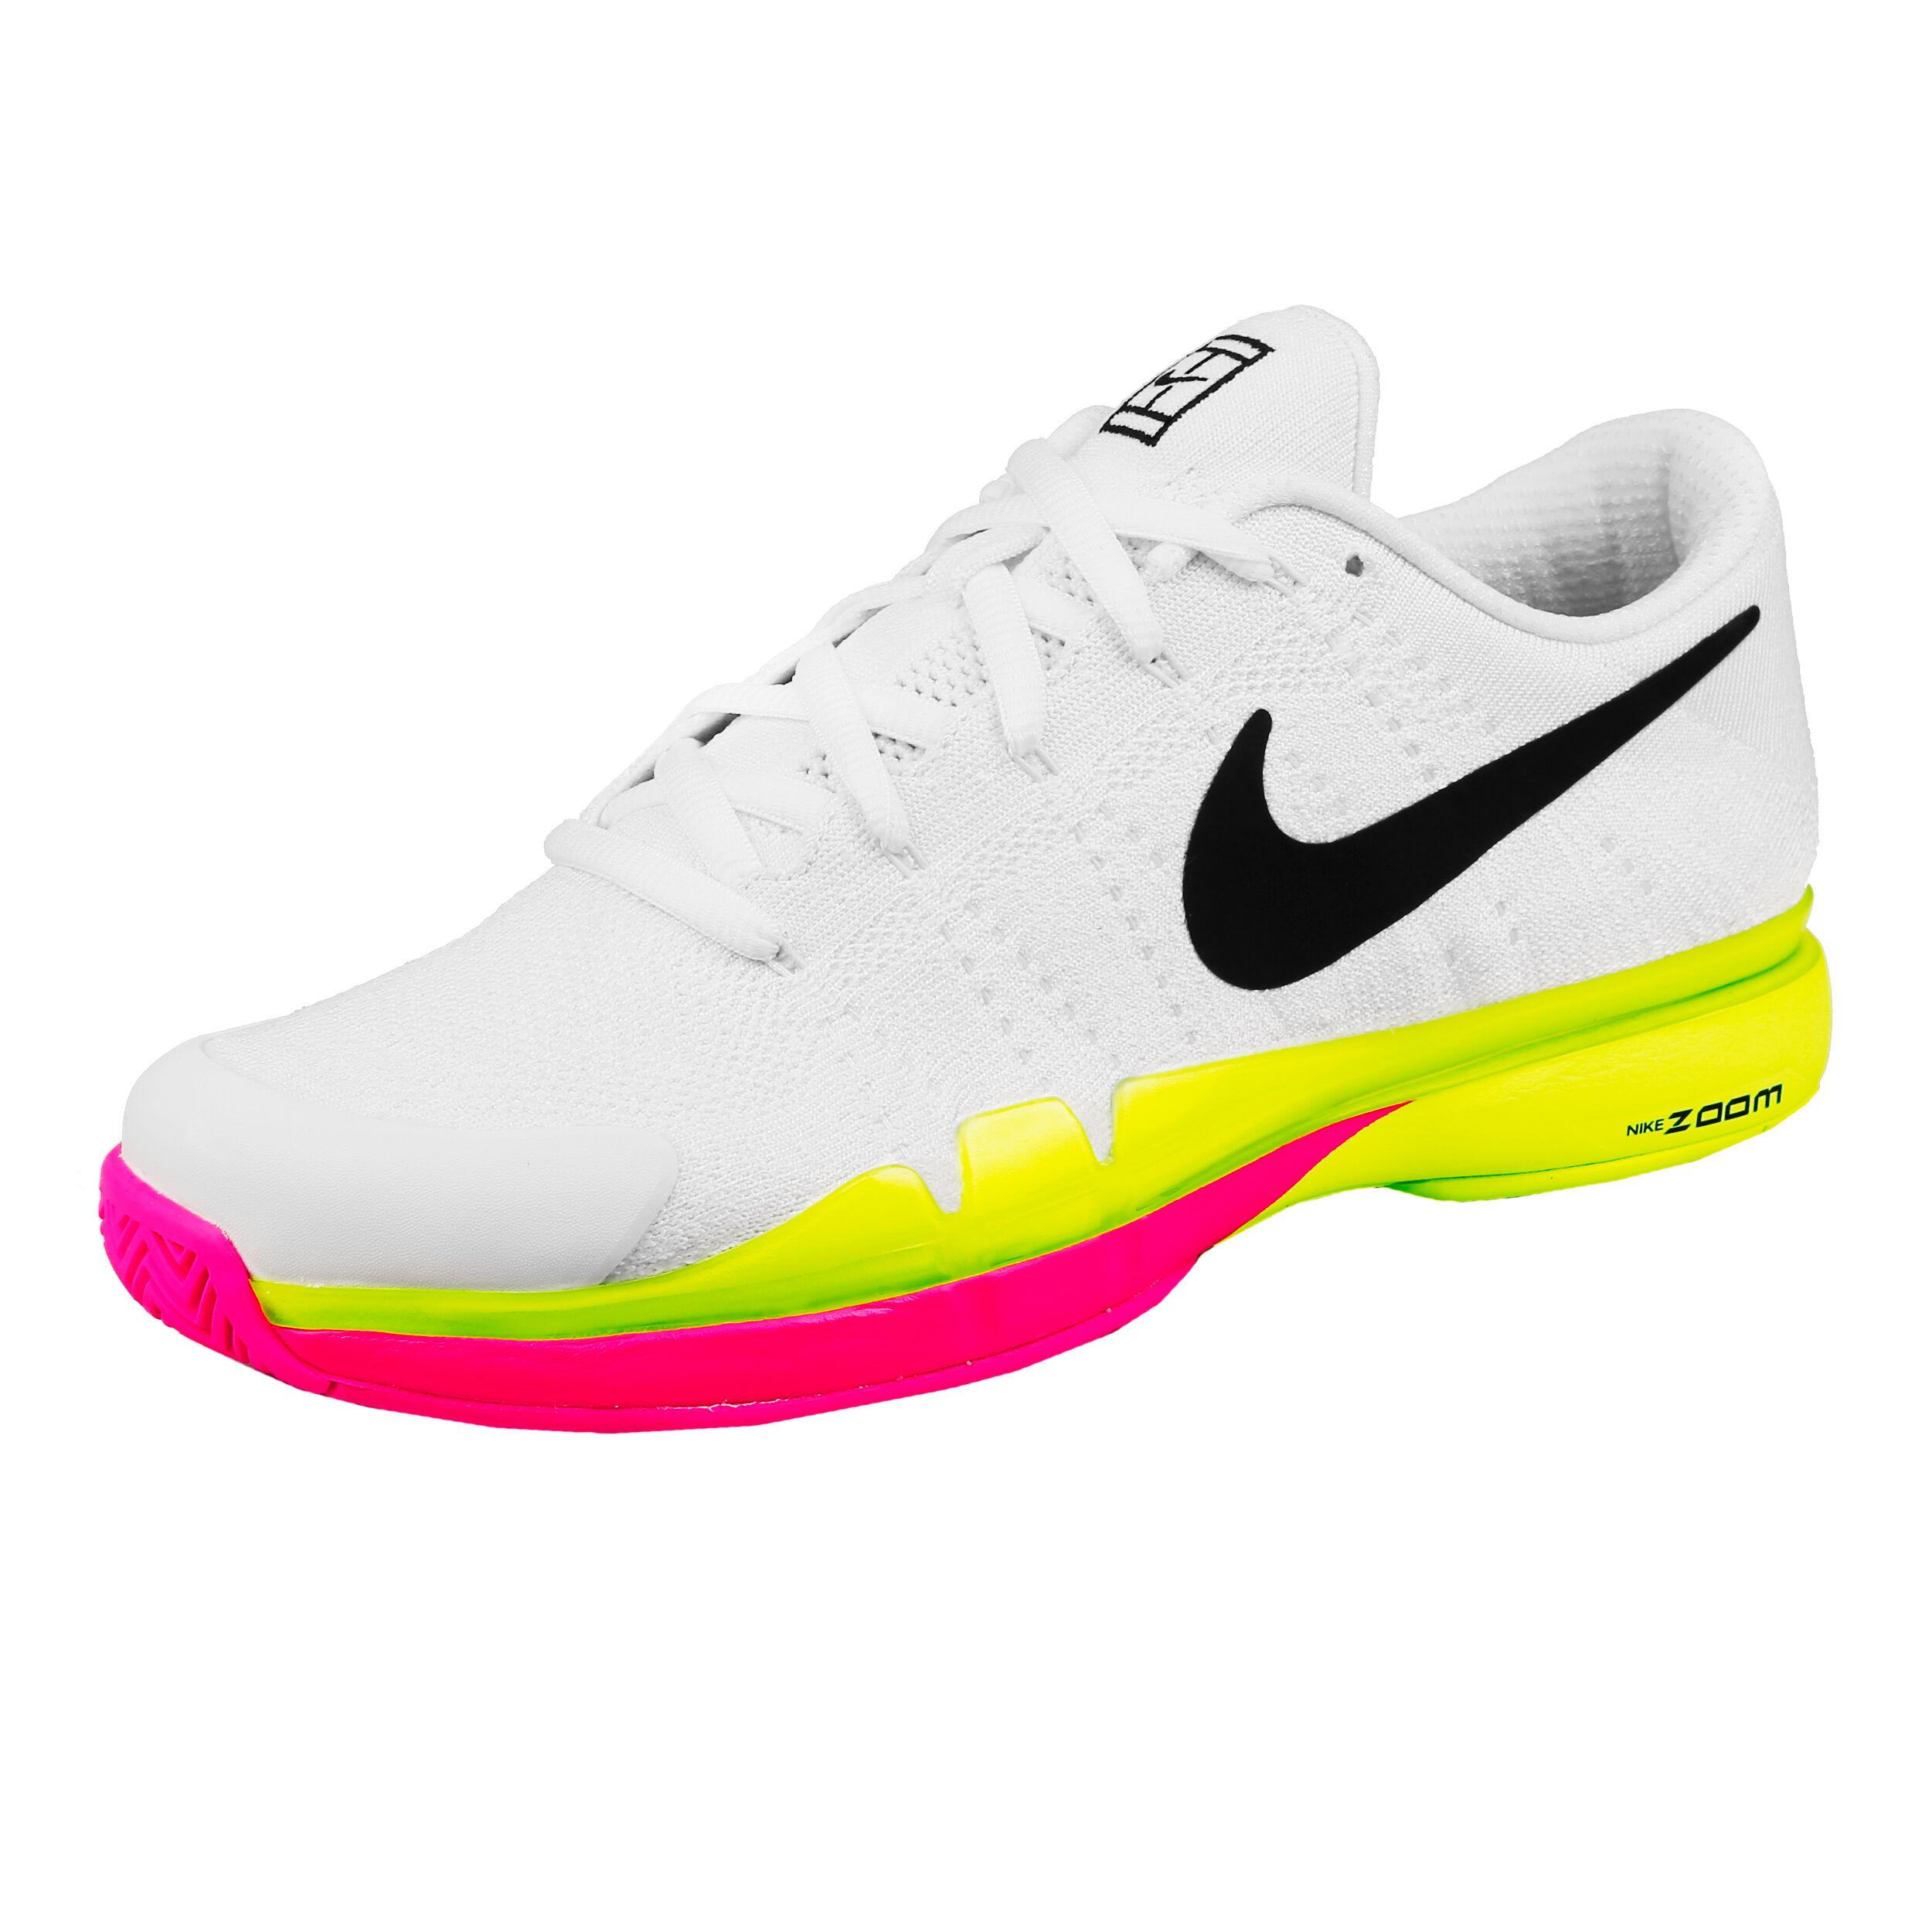 Nike Roger Federer Zoom Vapor 9.5 Tour Flyknit LE Scarpa Per Tutte Le Superfici Uomini Bianco, Giallo Neon